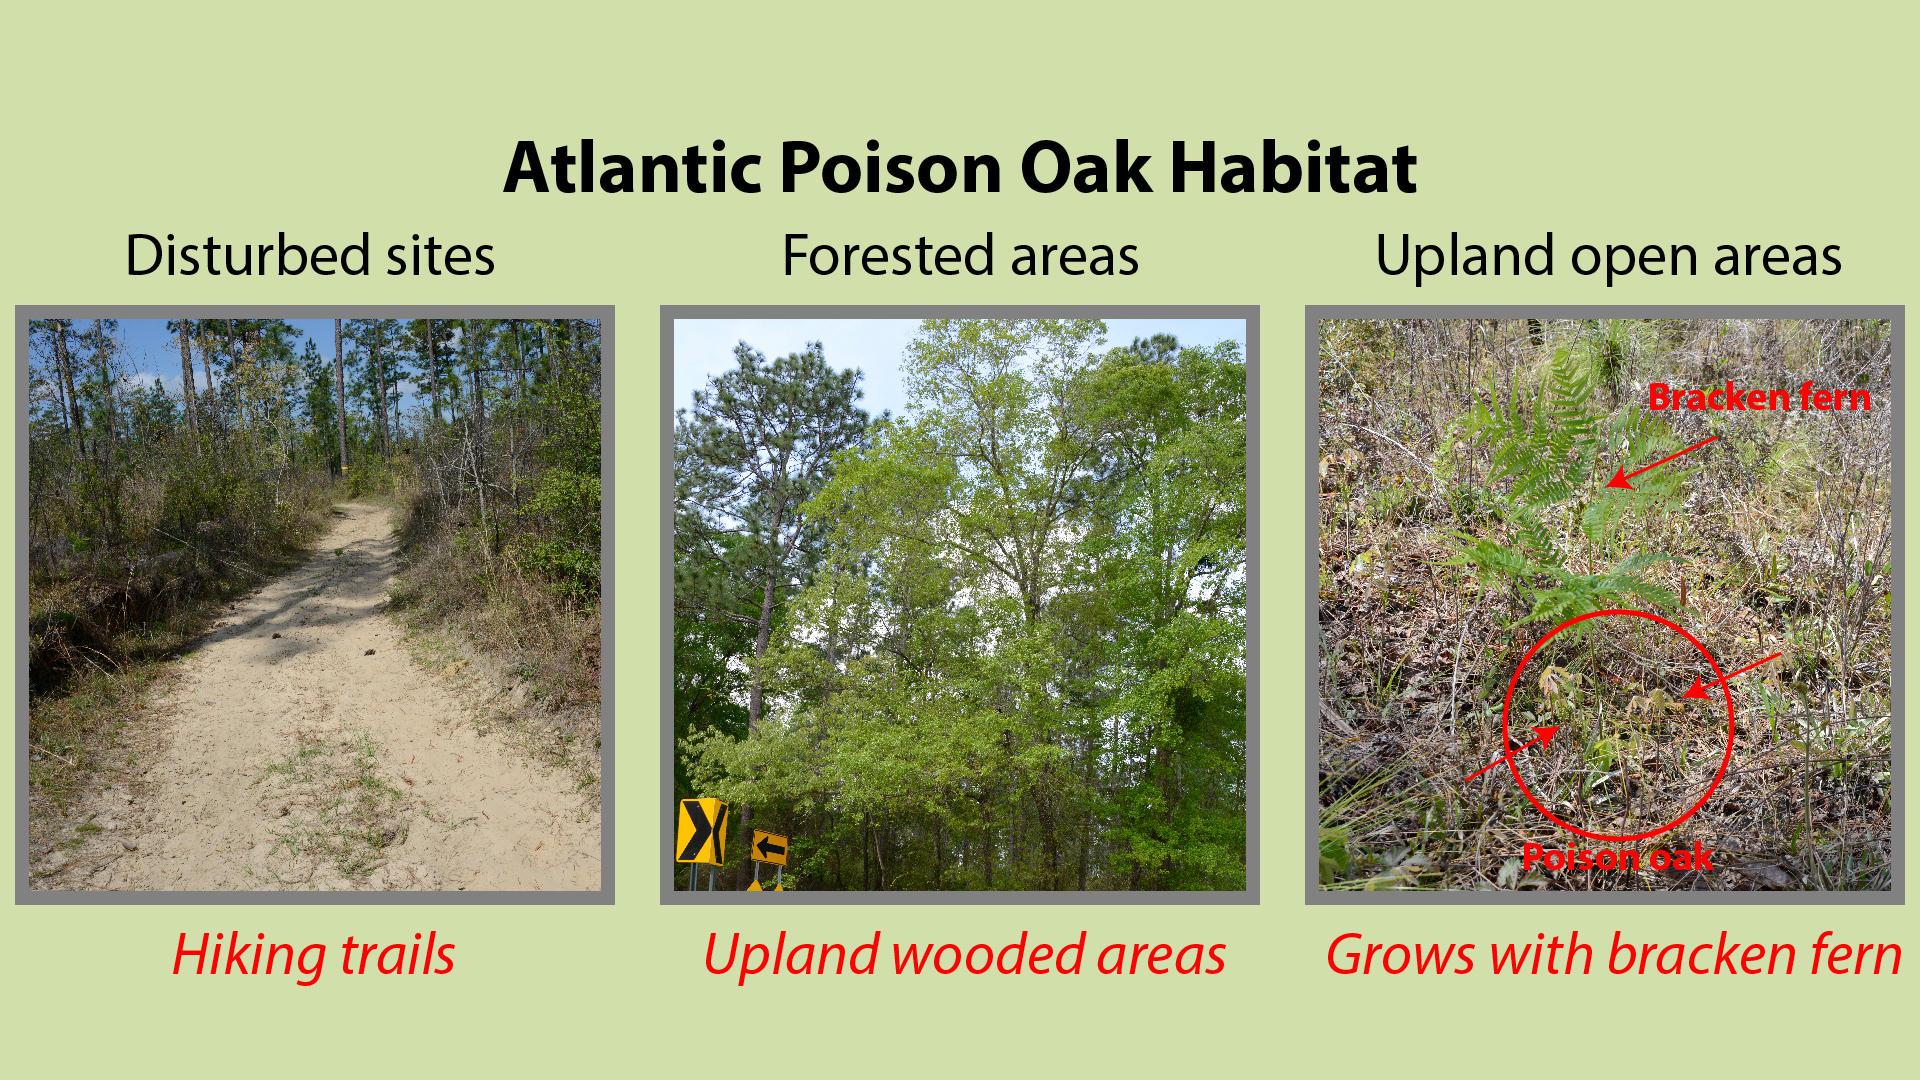 Atlantic Poison Oak Habitat